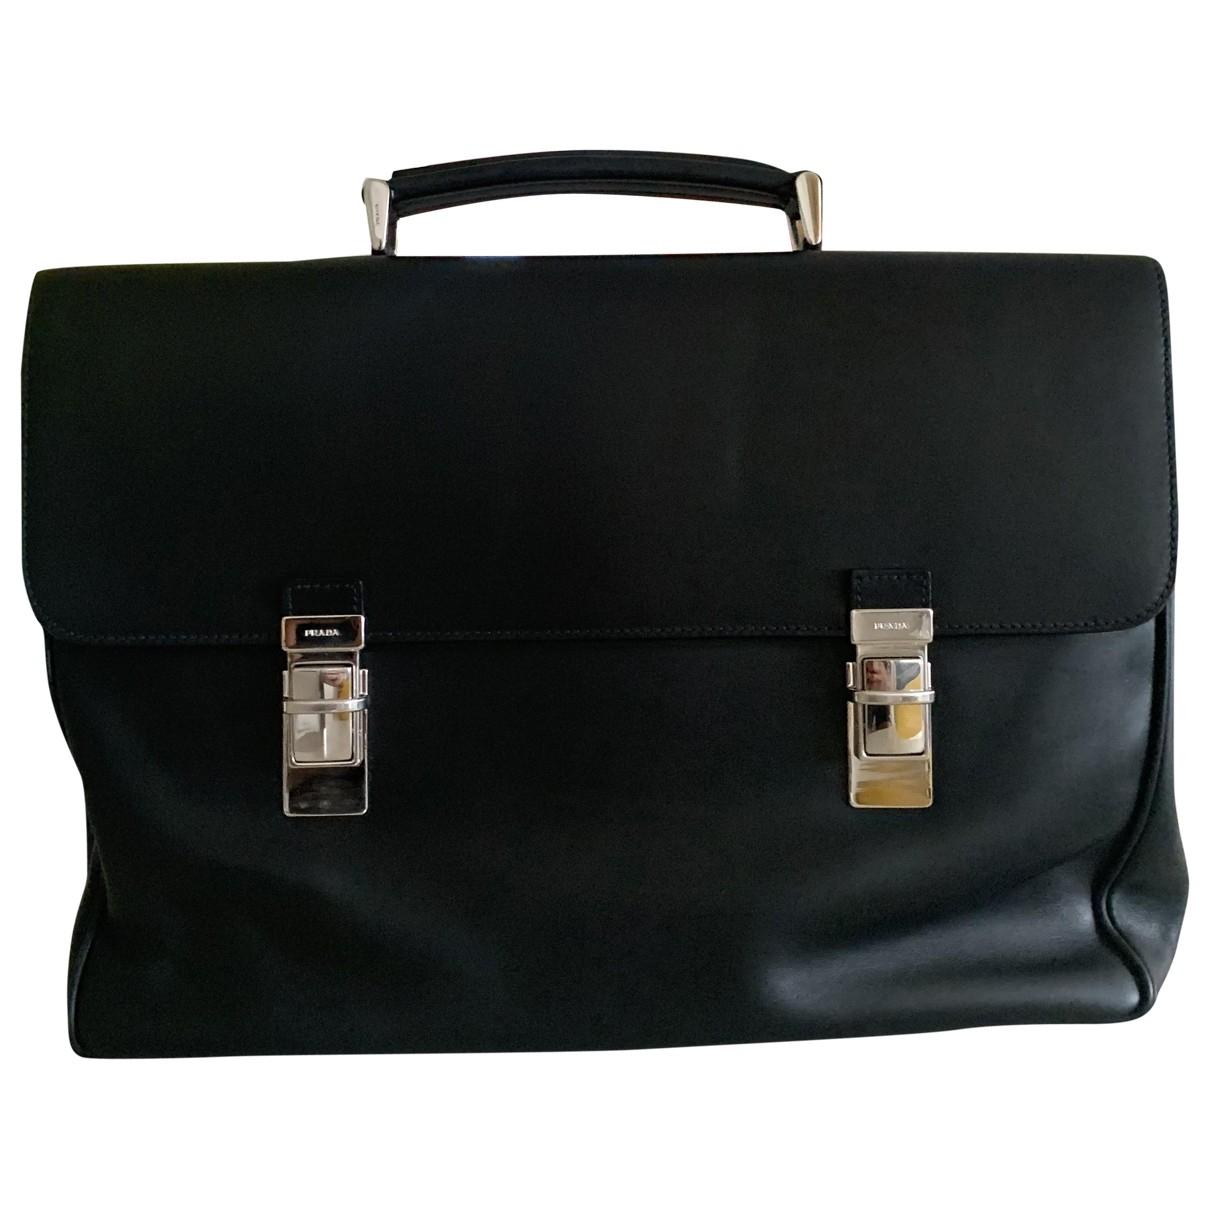 Prada \N Black Leather bag for Men \N